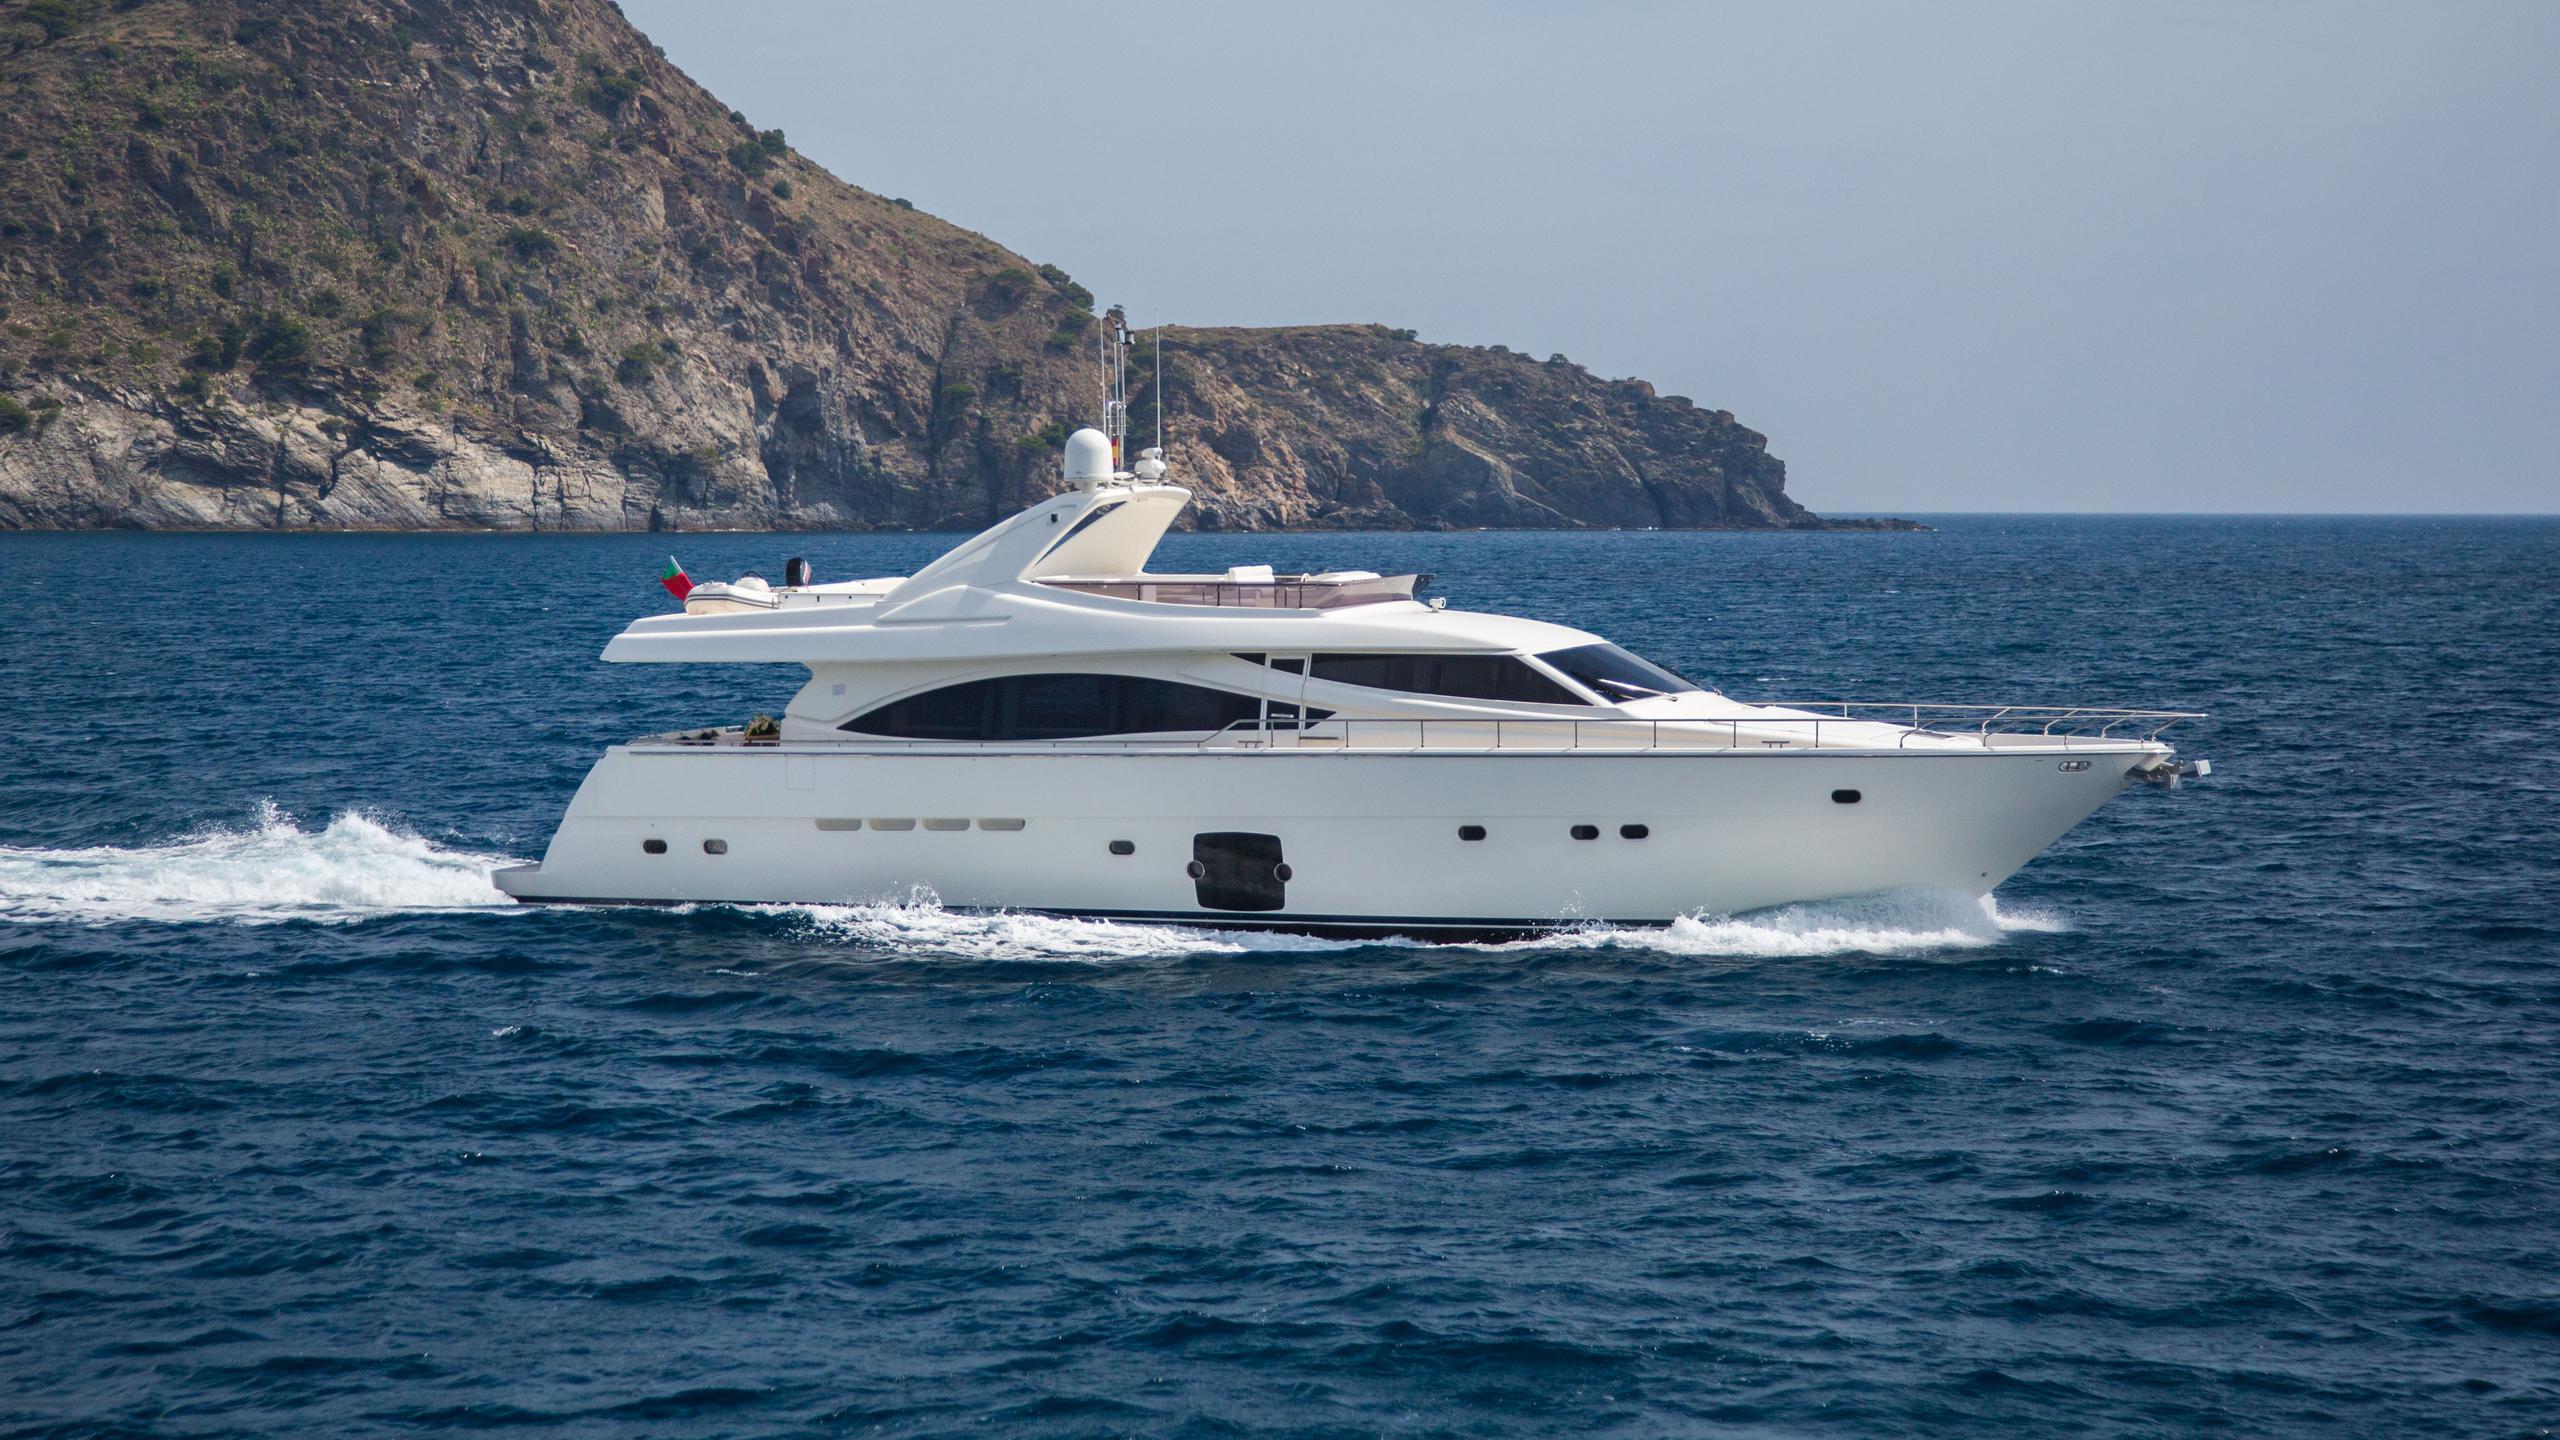 monticello-ii-yacht-for-sale-profile